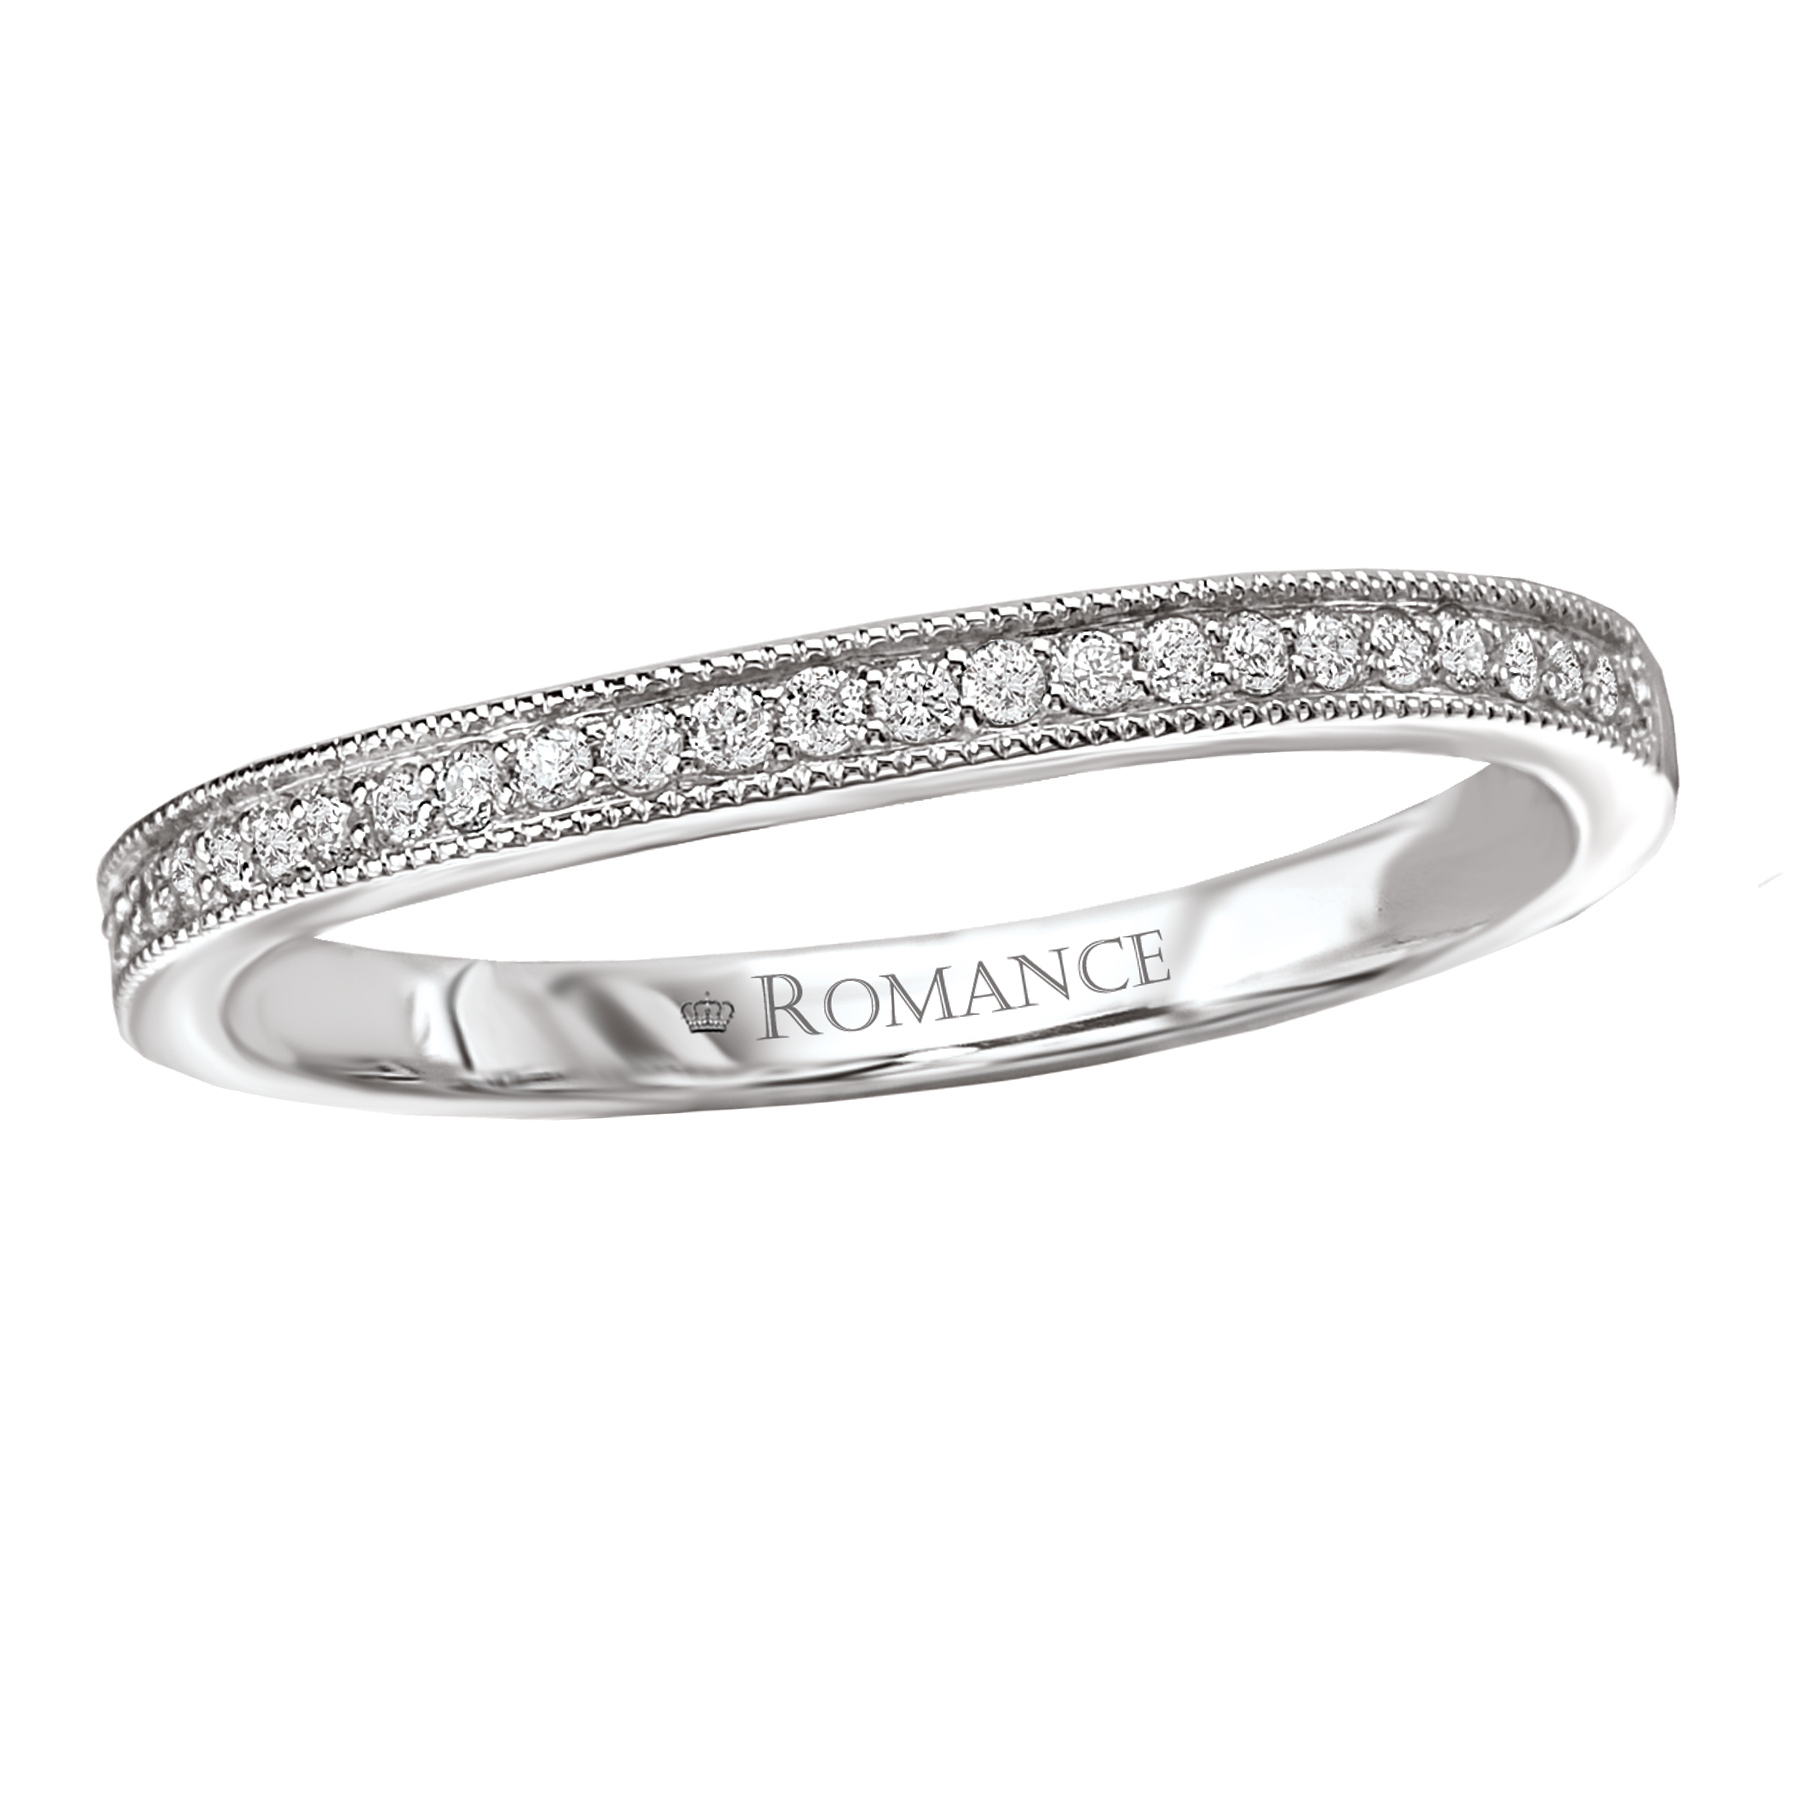 Romance Wedding Bands 117251-W product image